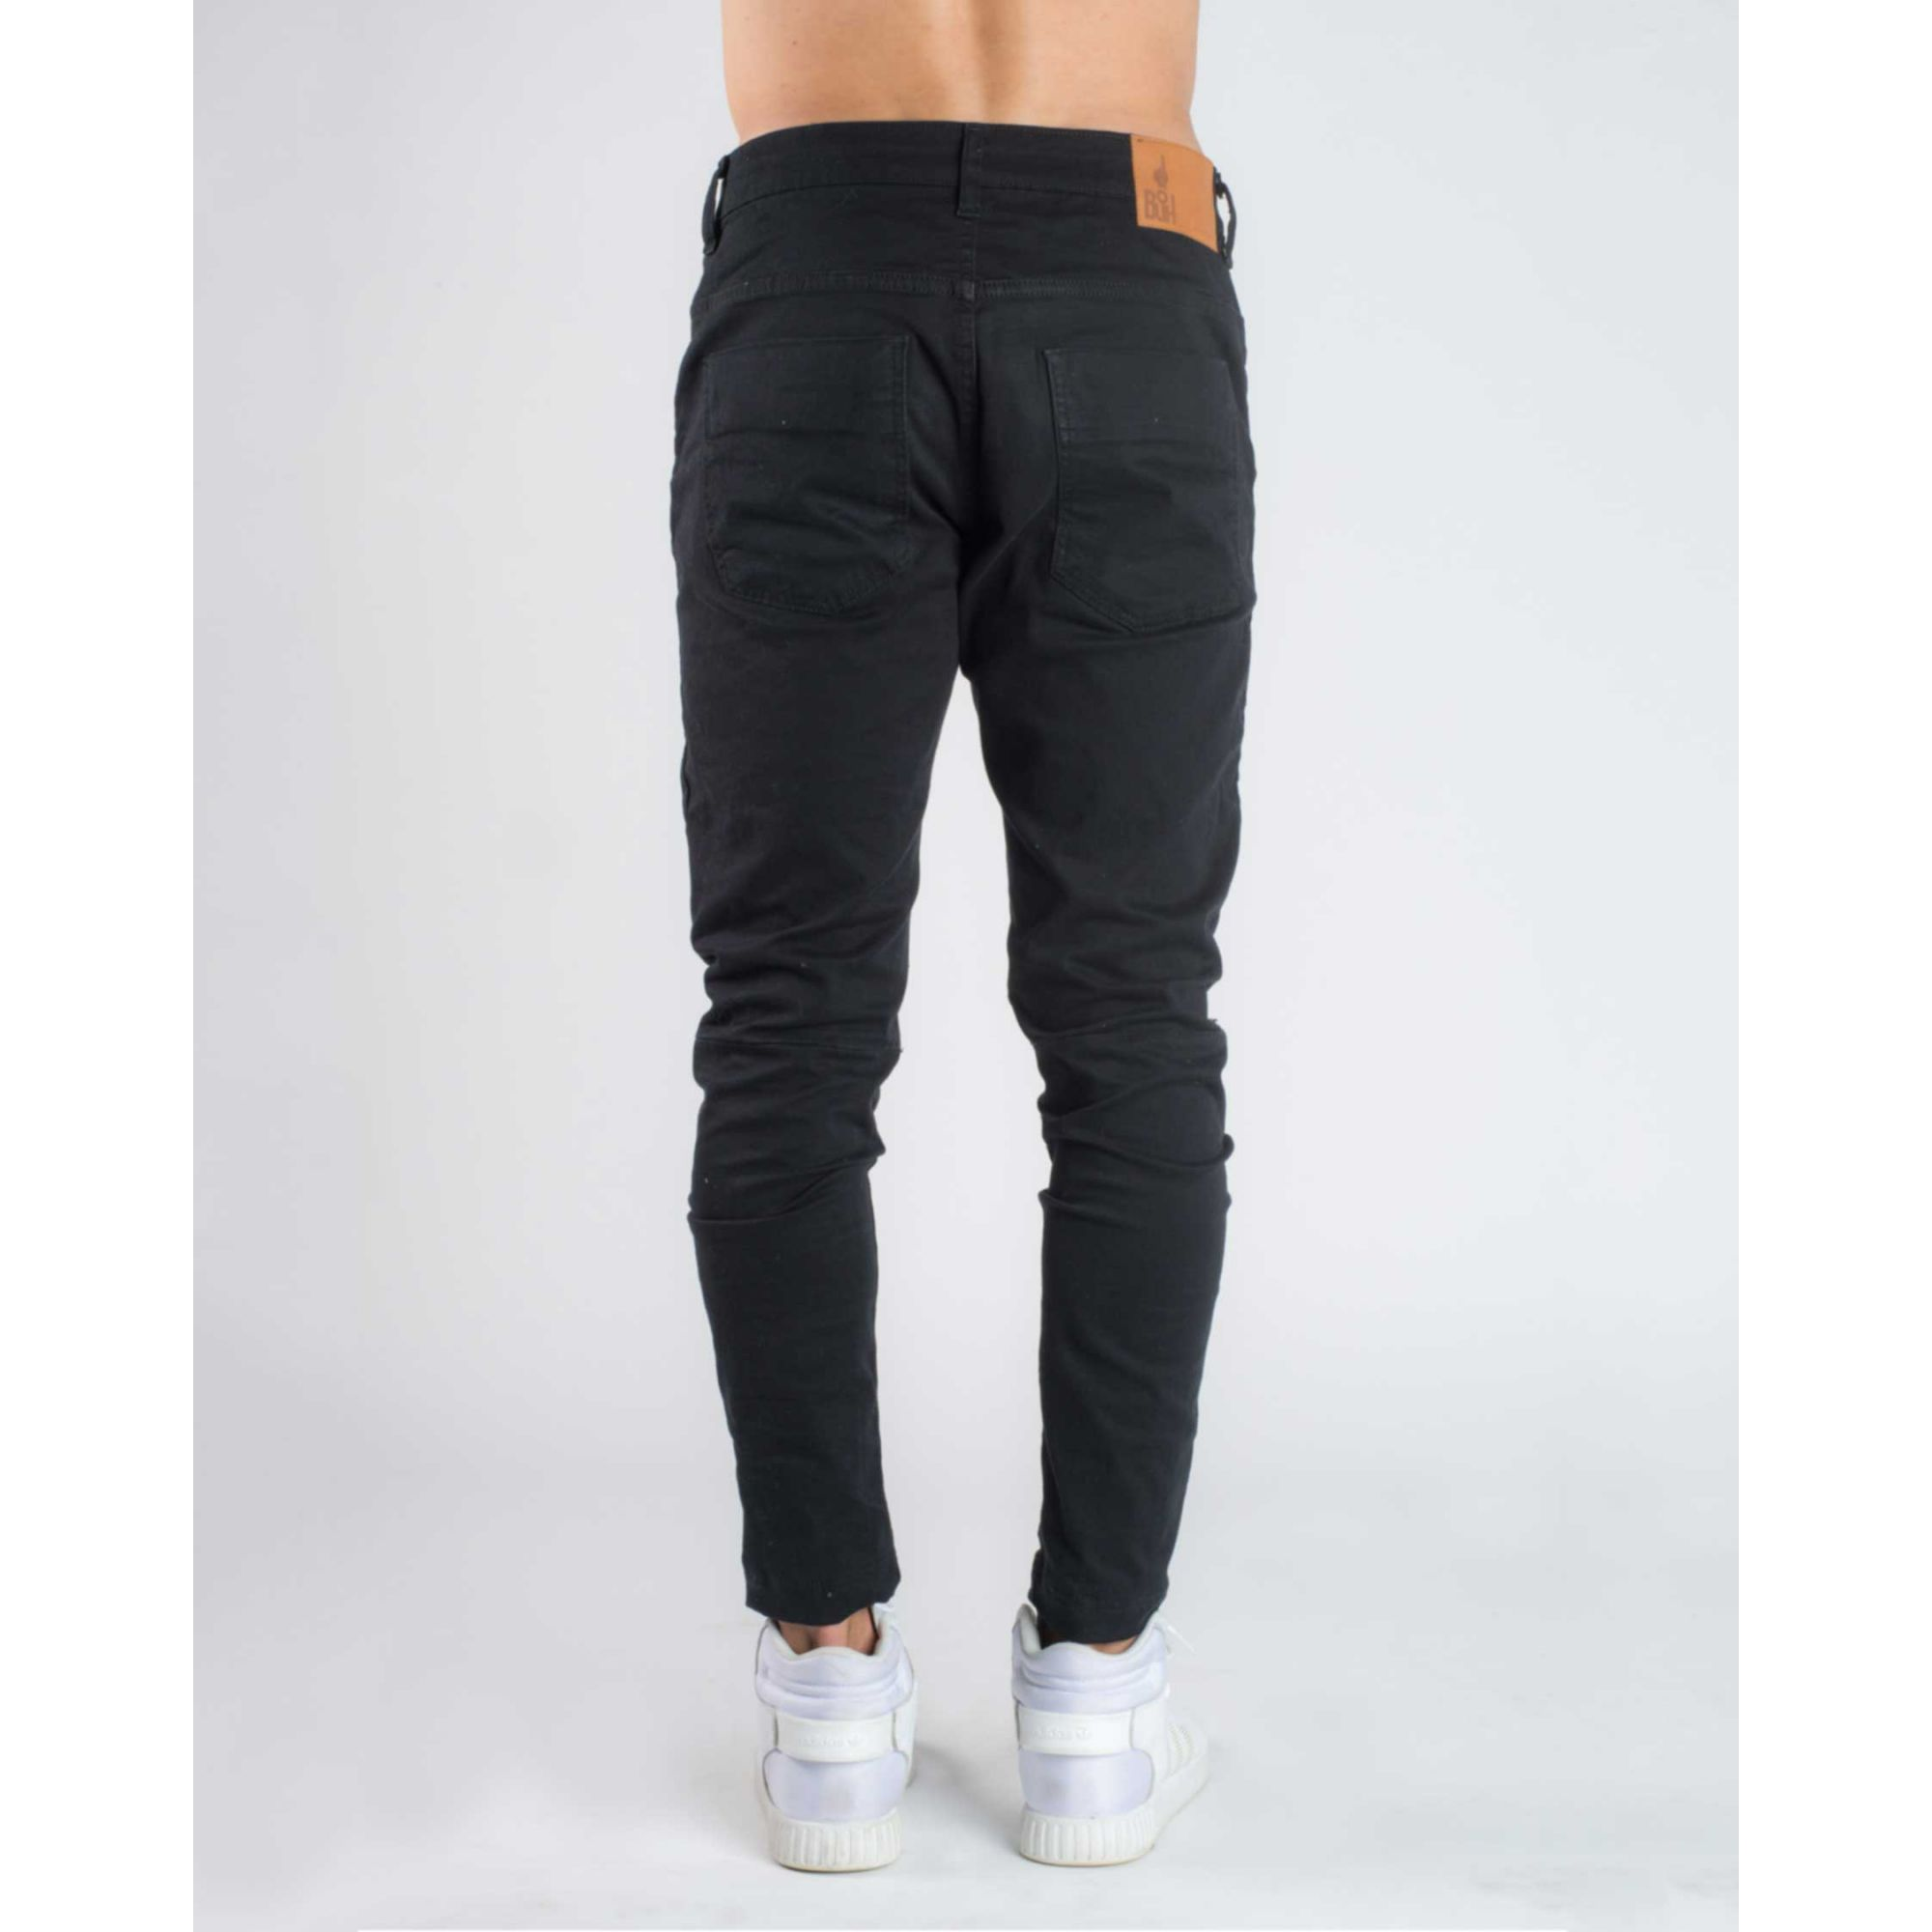 Calça Jeans Splash Black